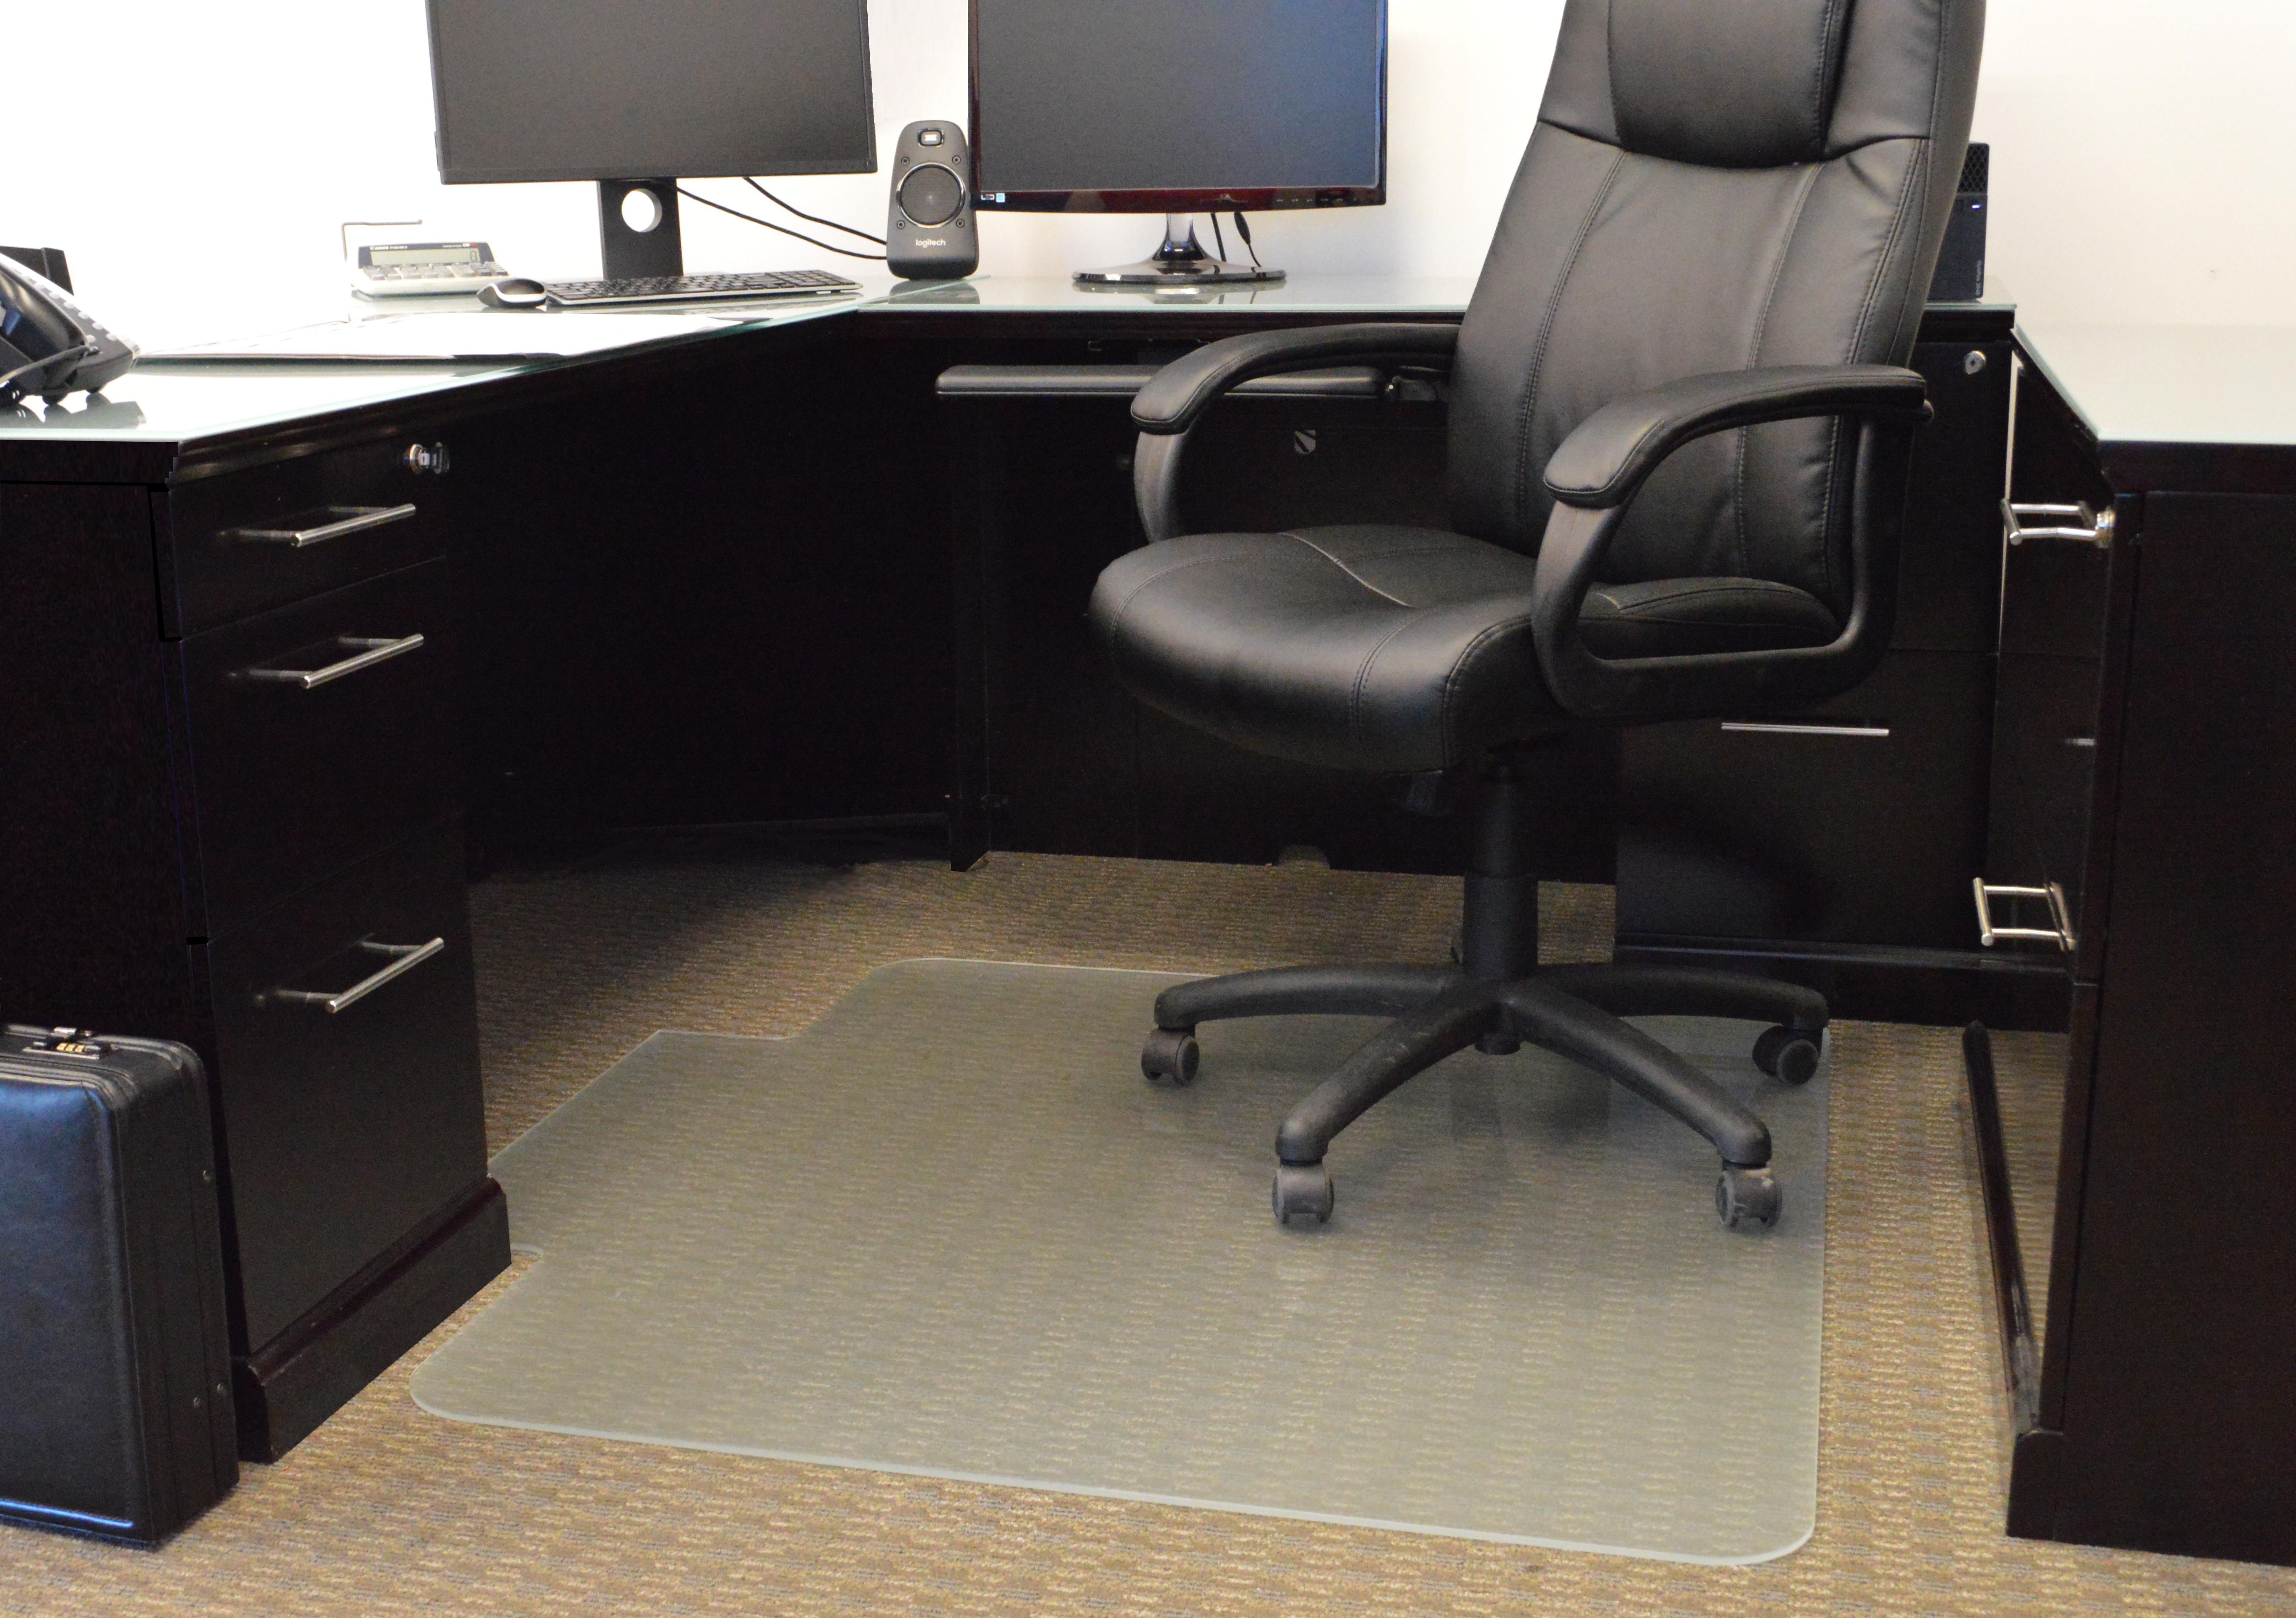 Denver Glass Interiors Moltin Glass Chair Mats Private Office Flooring